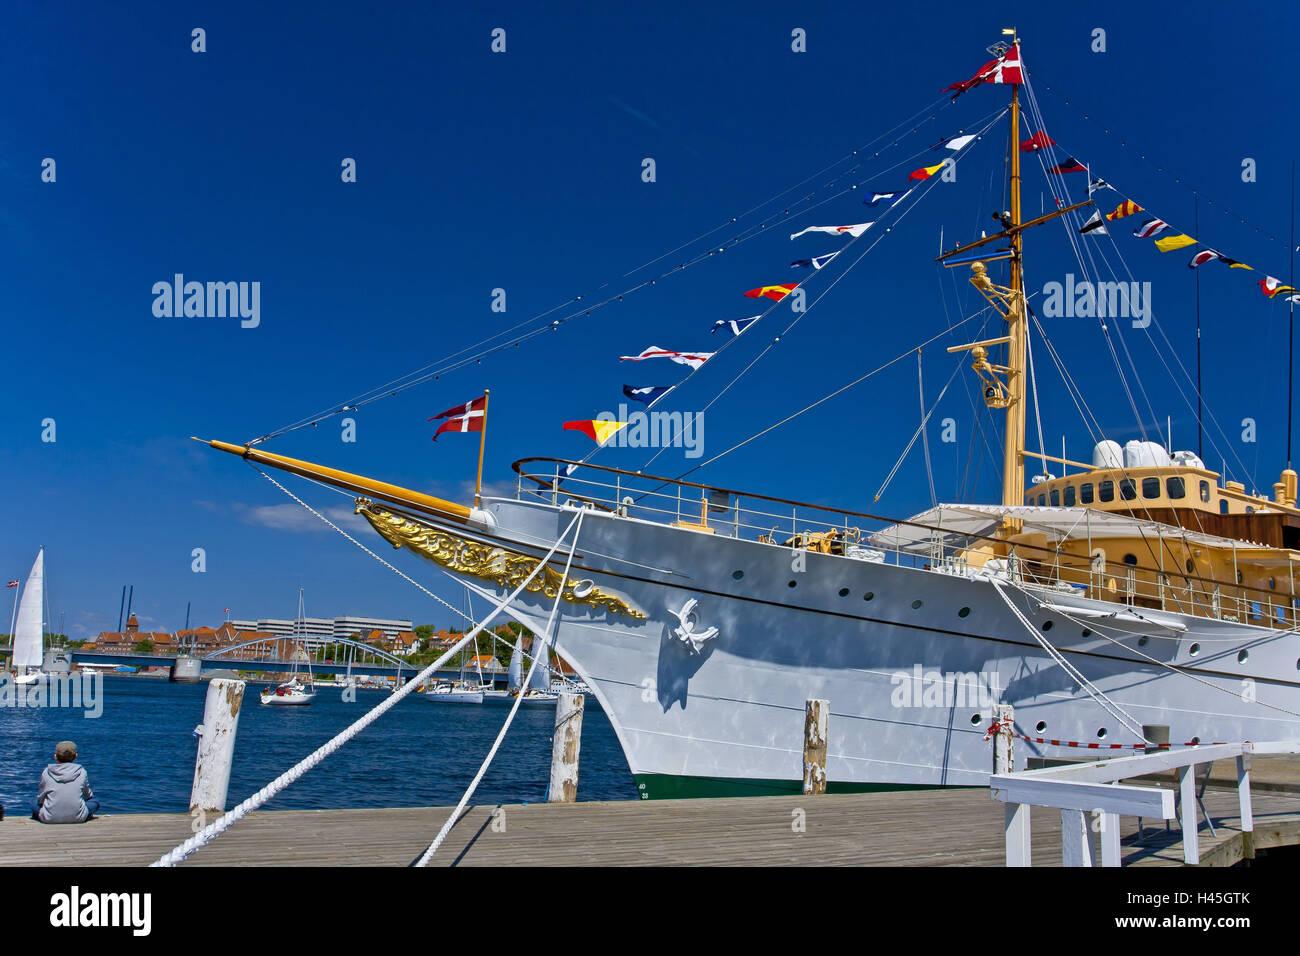 Denmark, Jutland, Sonderborg, pier, royal yacht 'Dannebrog', boy, harbour wall, sitting, - Stock Image